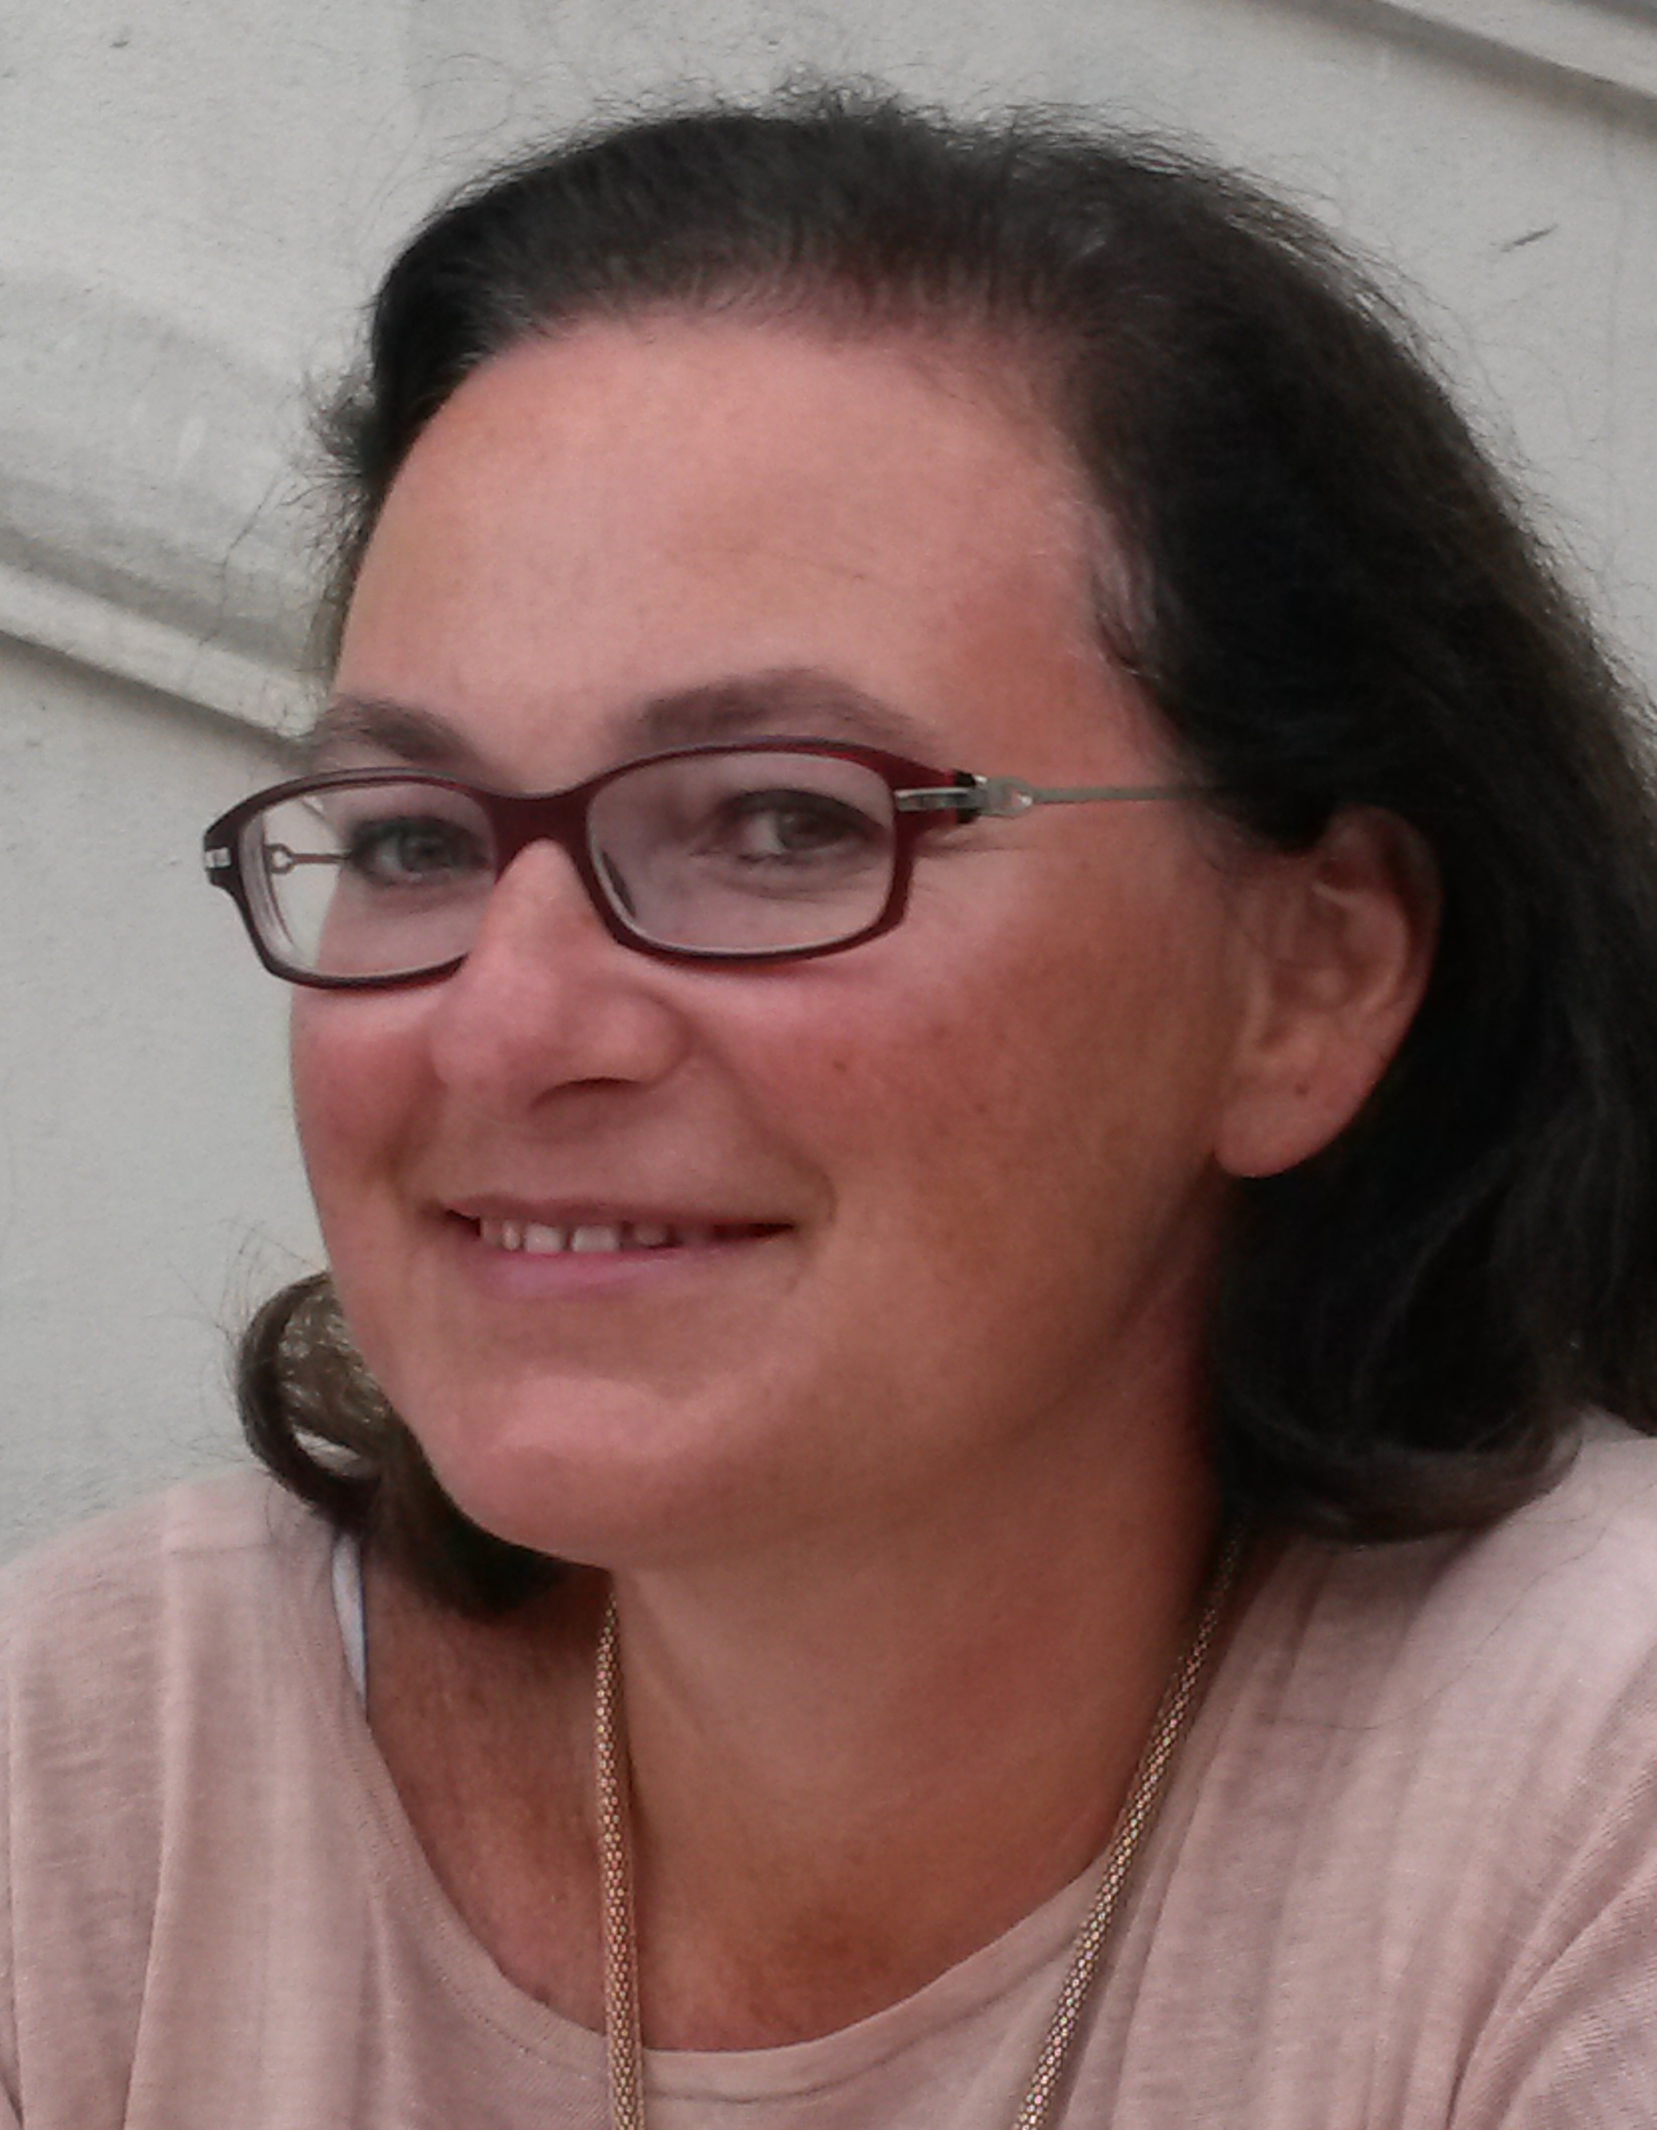 Claudia Rittmann-Pechtl